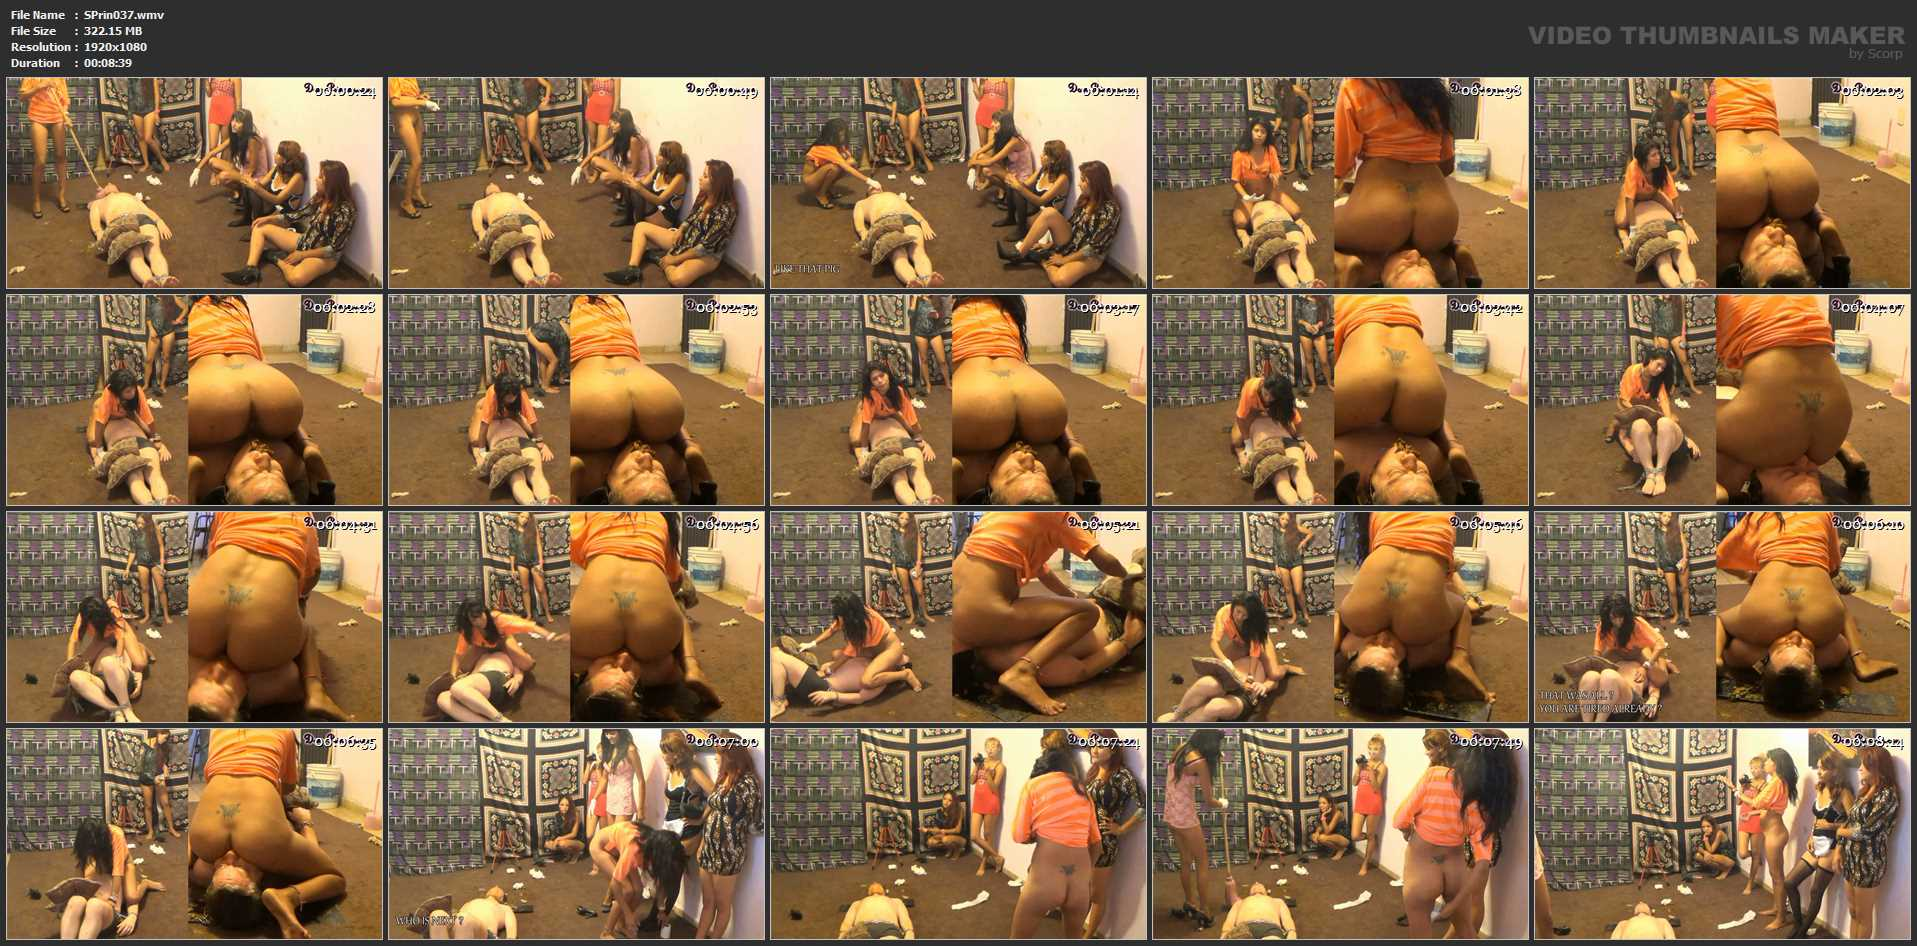 [SCAT-PRINCESS] Horse Back Riding Princess Style II Part 4 Andrea [FULL HD][1080p][WMV]